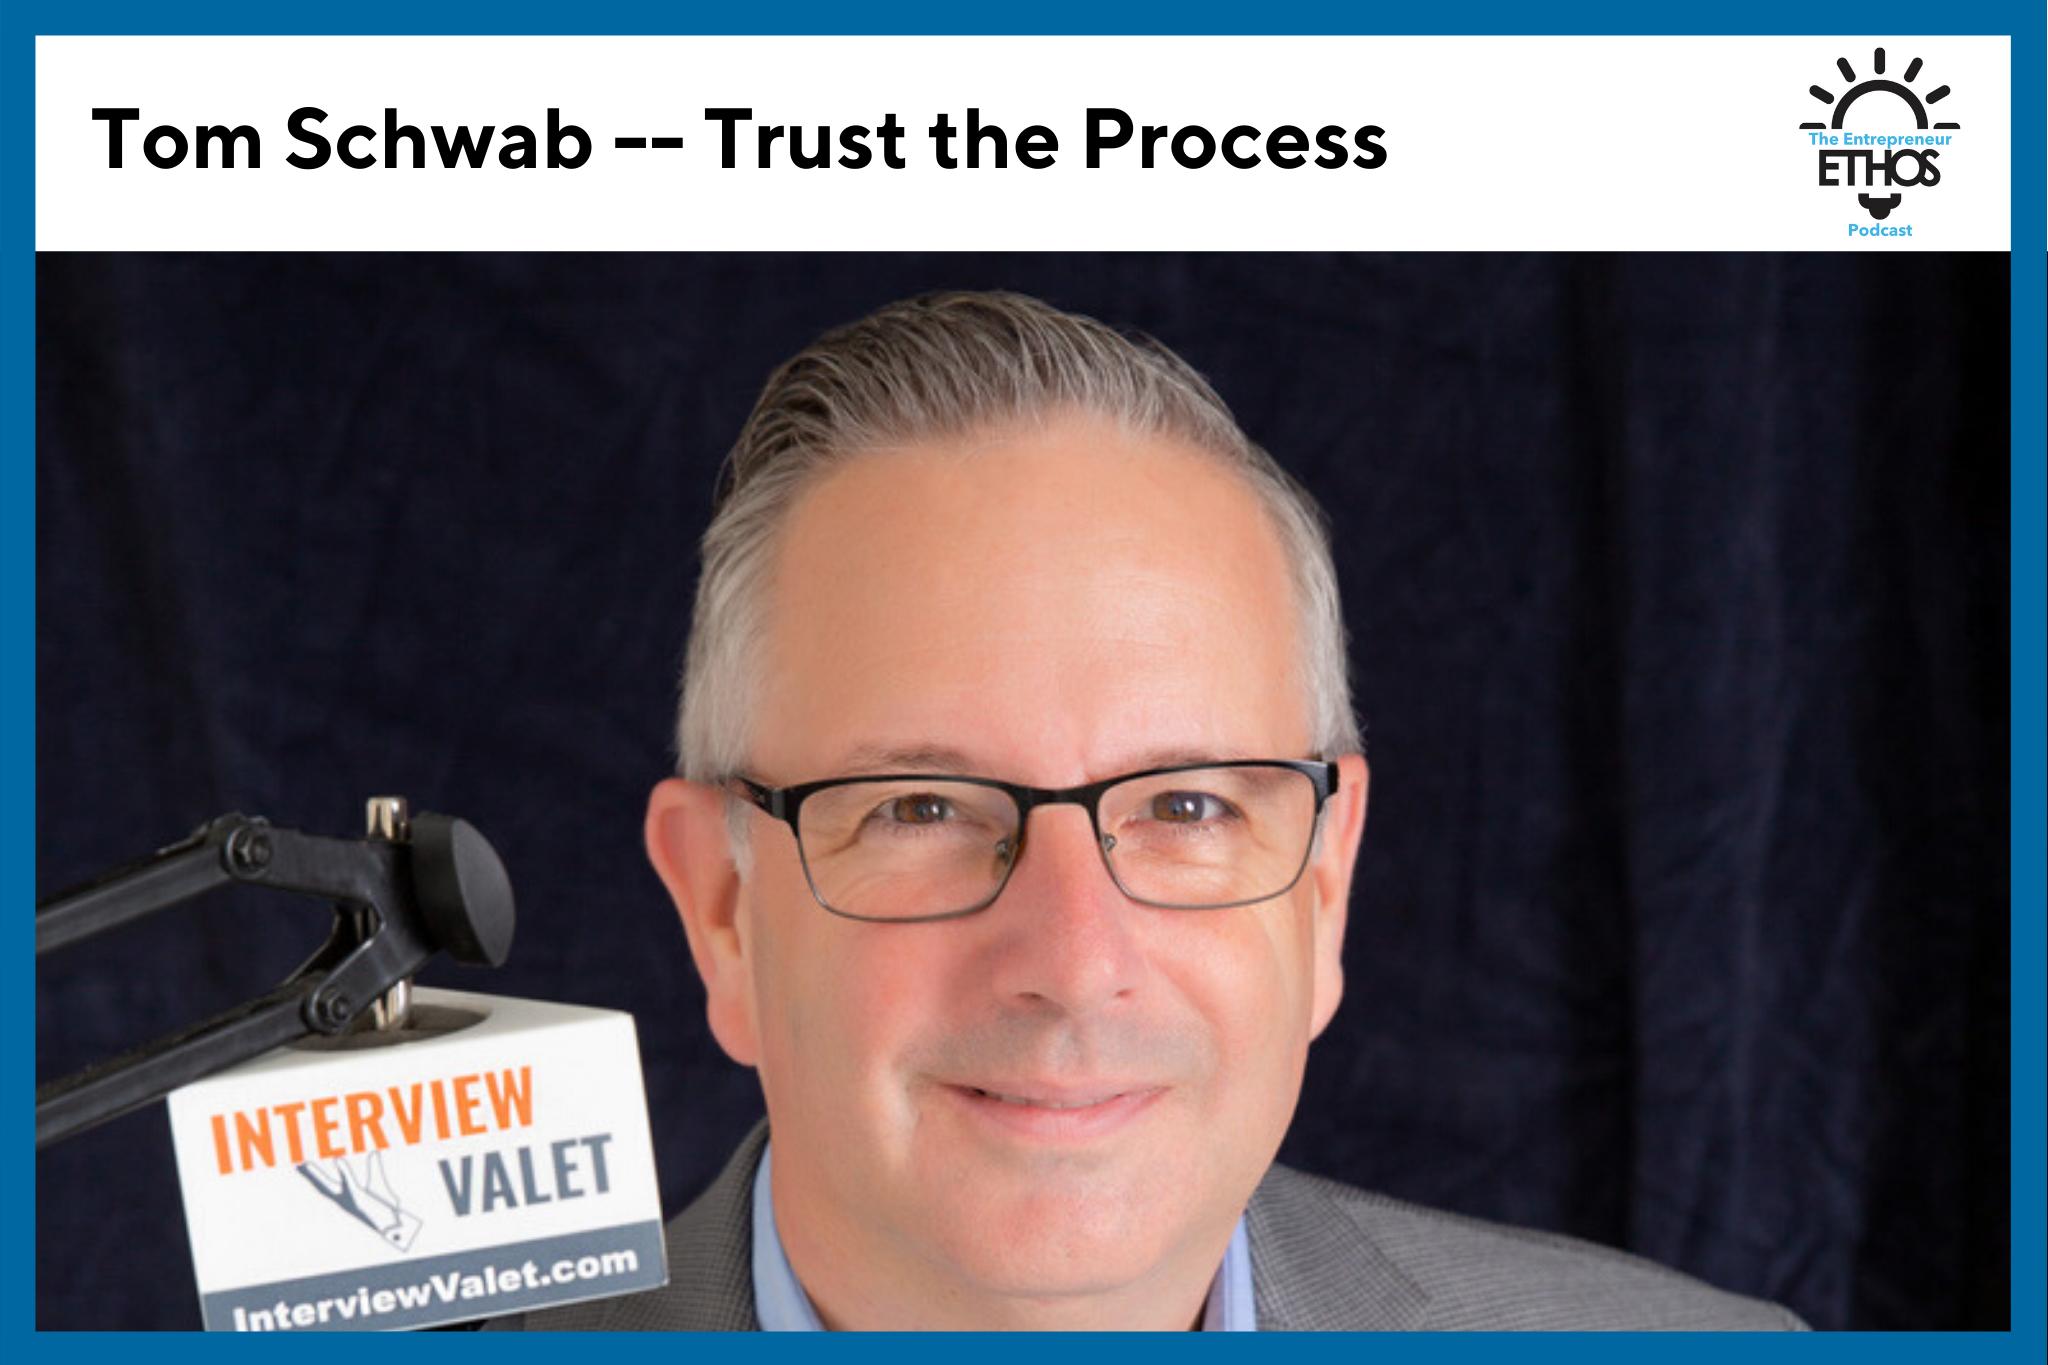 Trust the Process with Tom Schwab